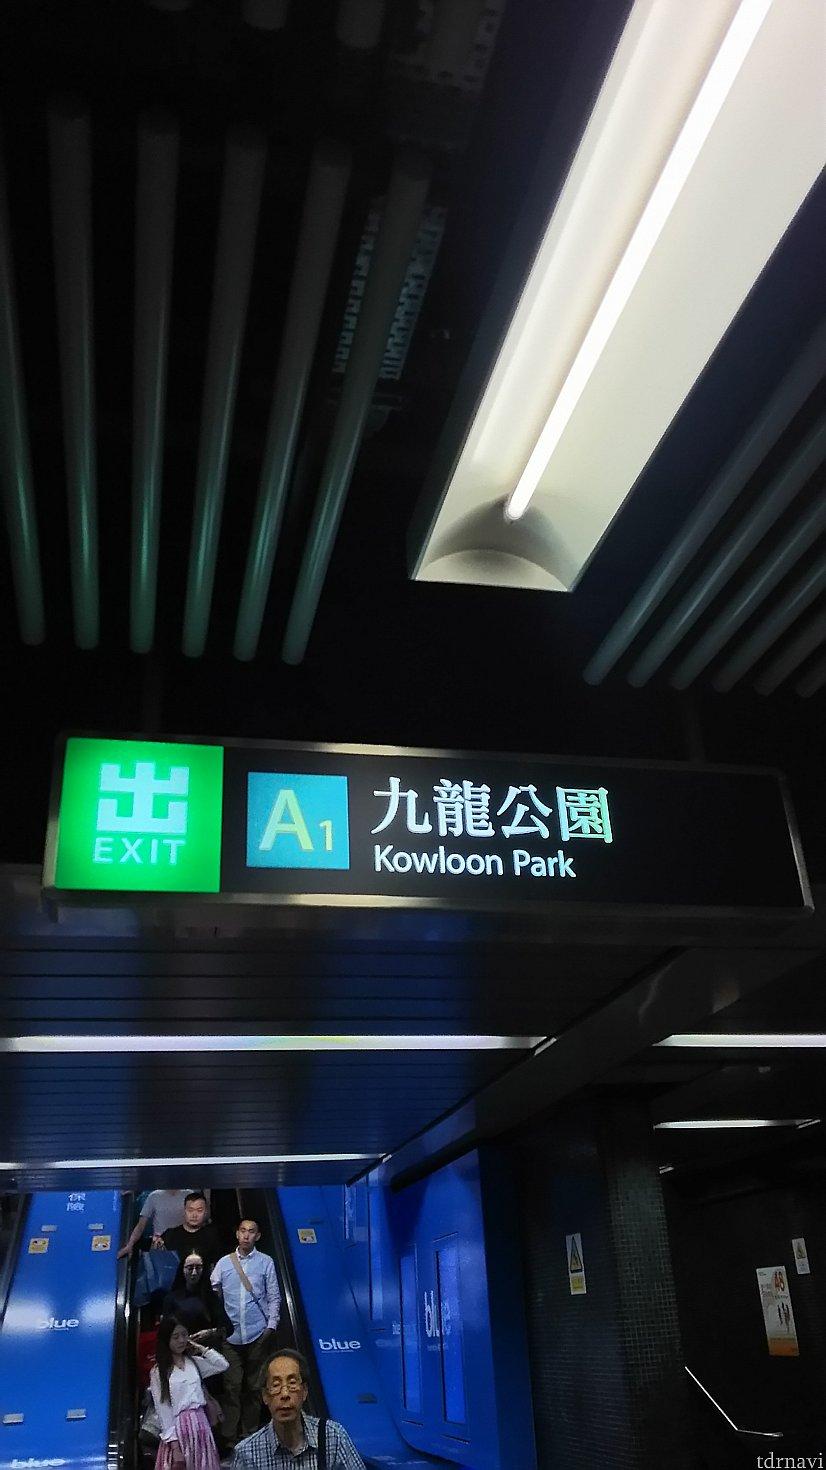 A出口は2つあって、A1の九龍公園出口を出ます